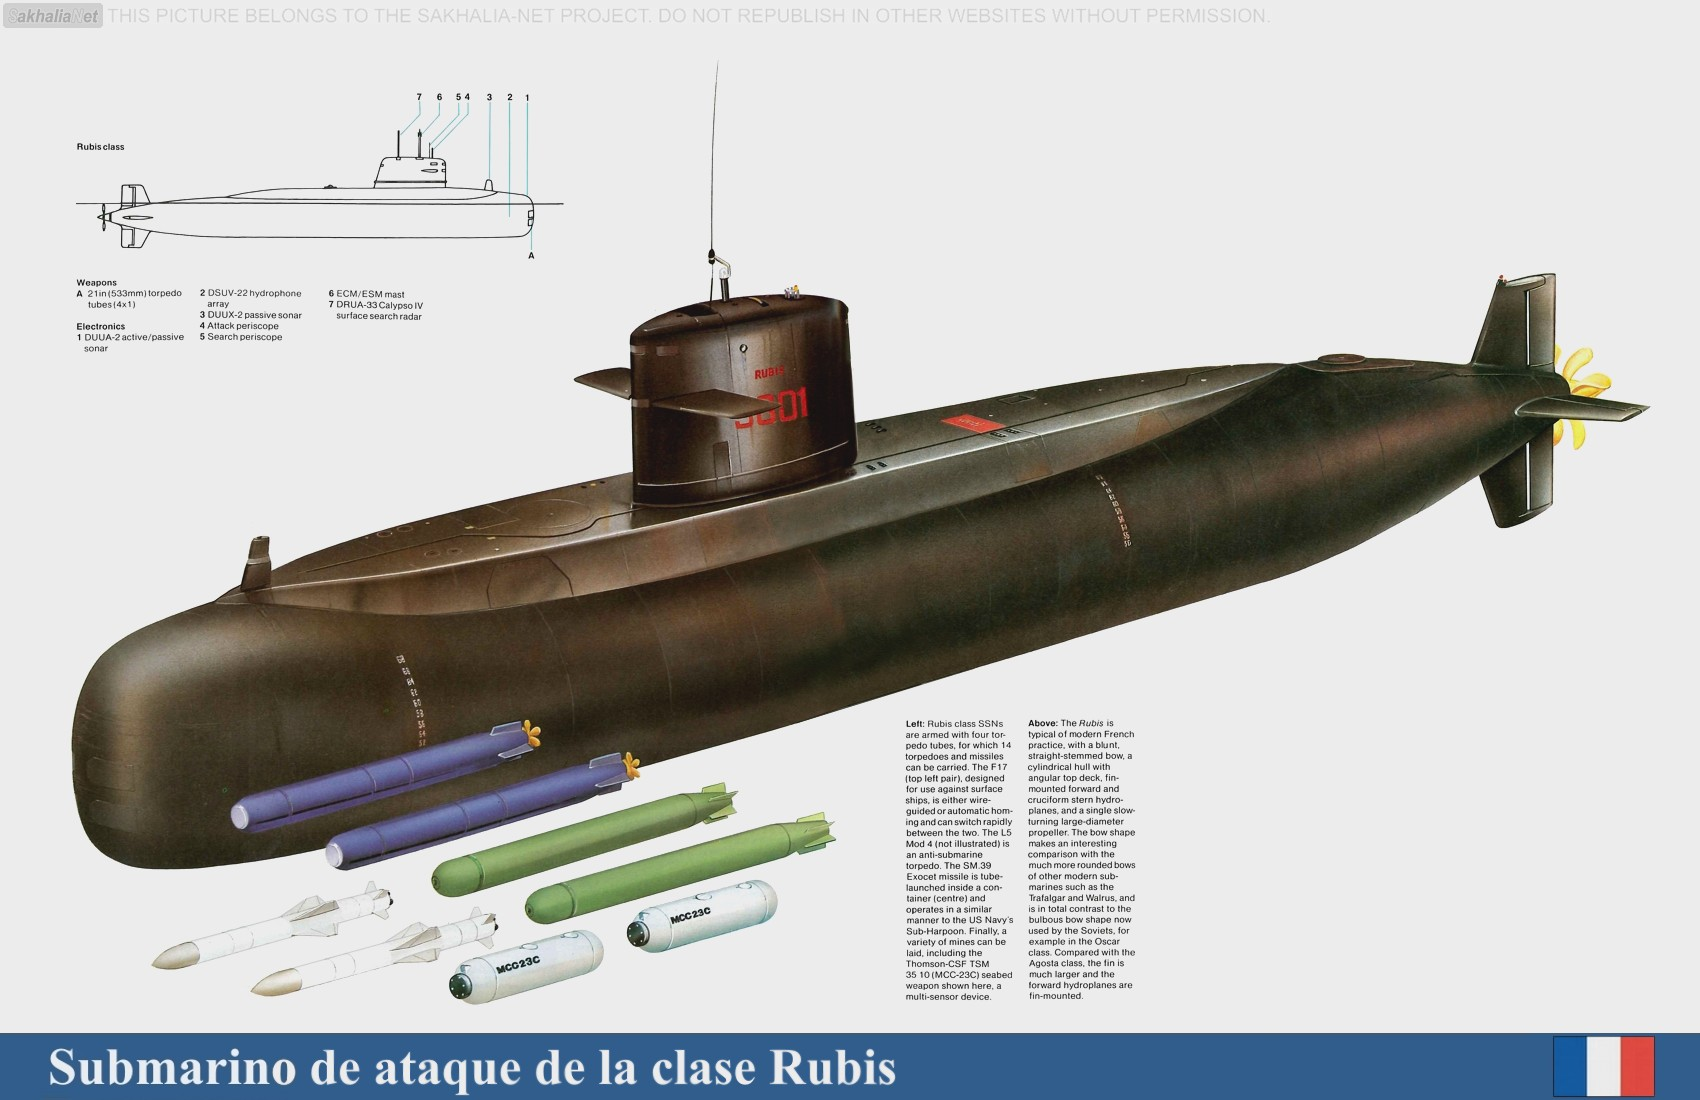 rubis_class